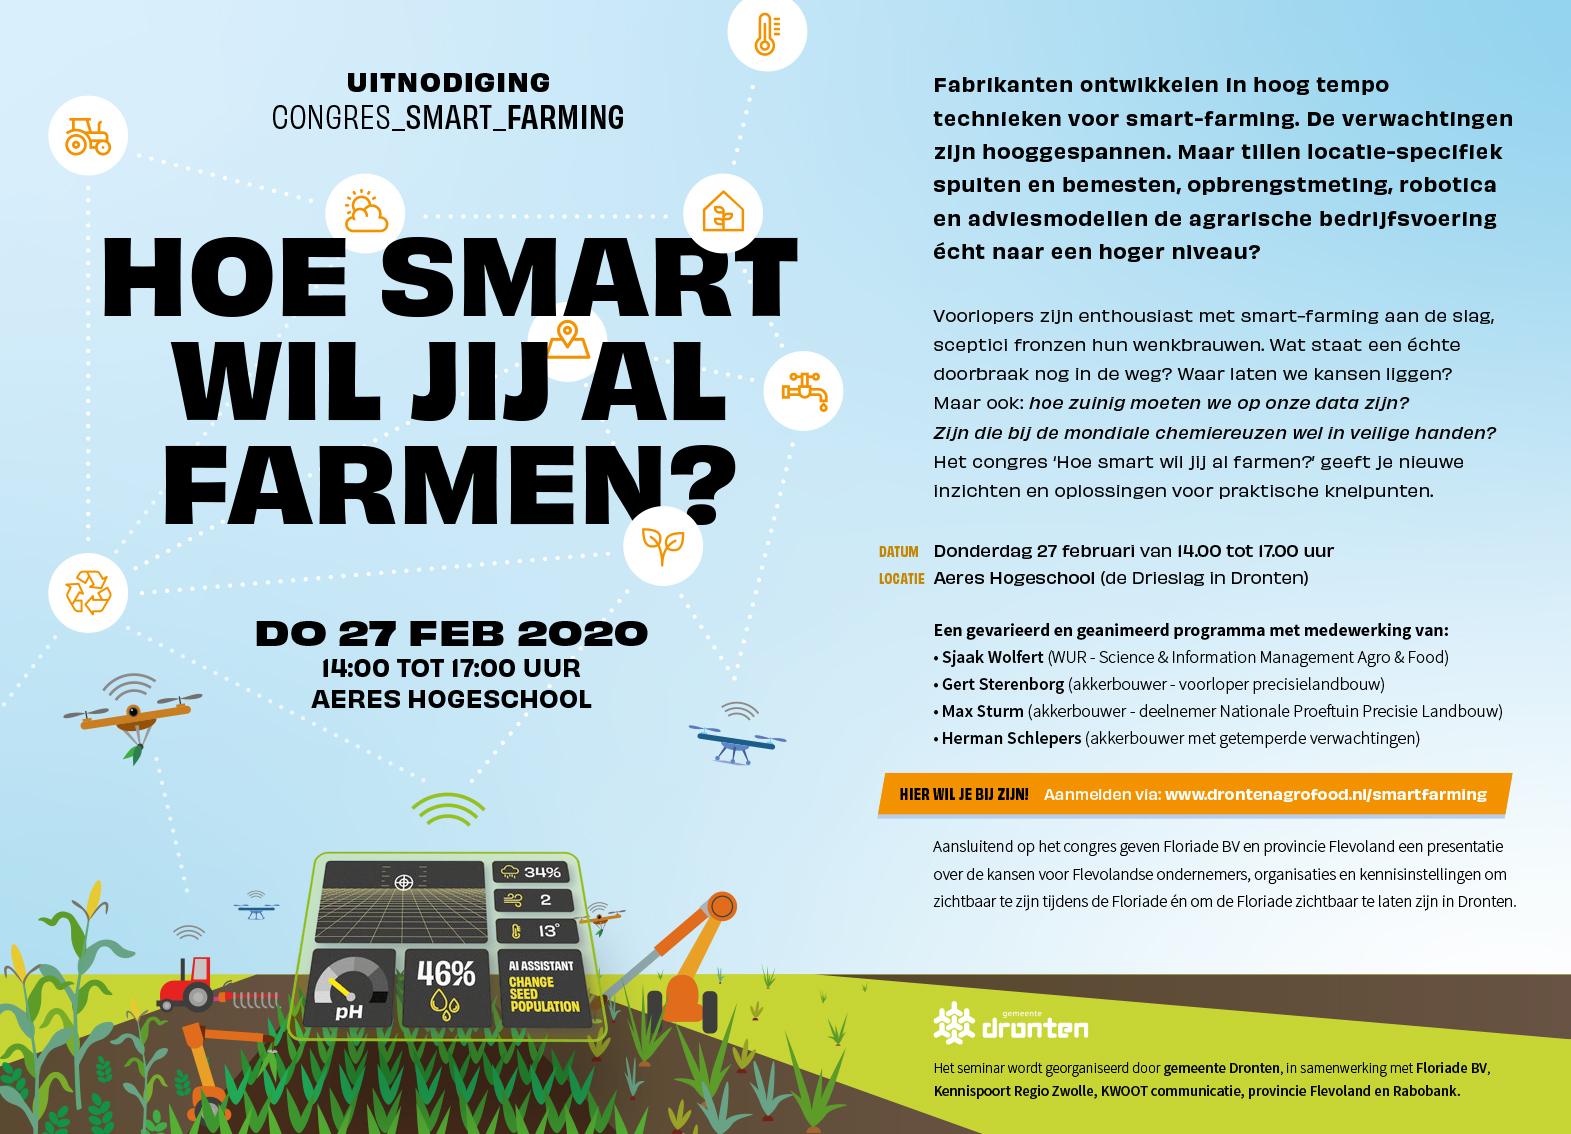 Omgevingsvisie FlevolandStraks beeld: Uitnodiging congres 270220 Smart Farming (002)